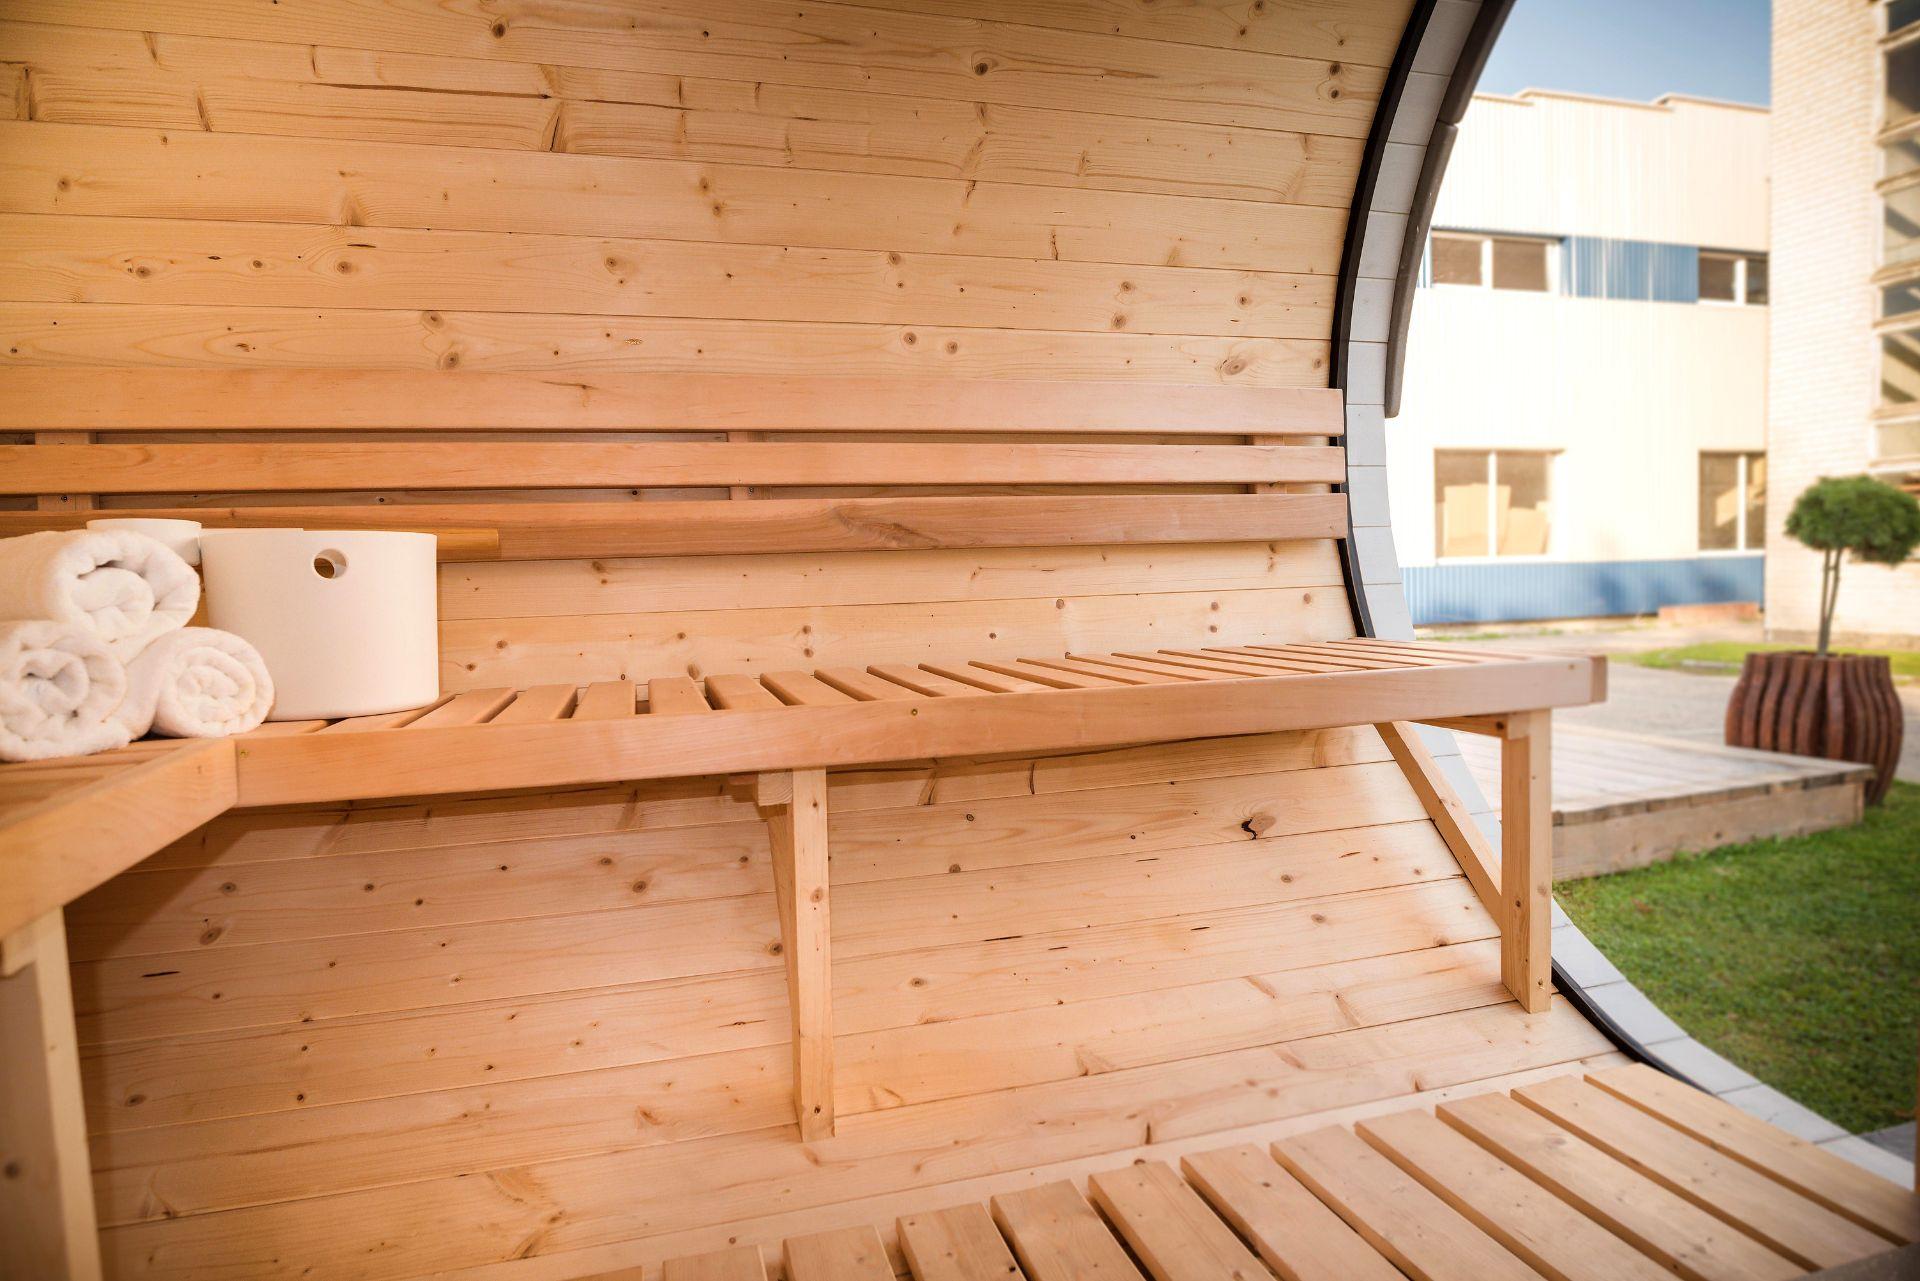 Lot 18018 - V Brand New Superb Extra Large Sauna Extended Barrel 2.4m x 4.3m - Separate Sitting/Changing